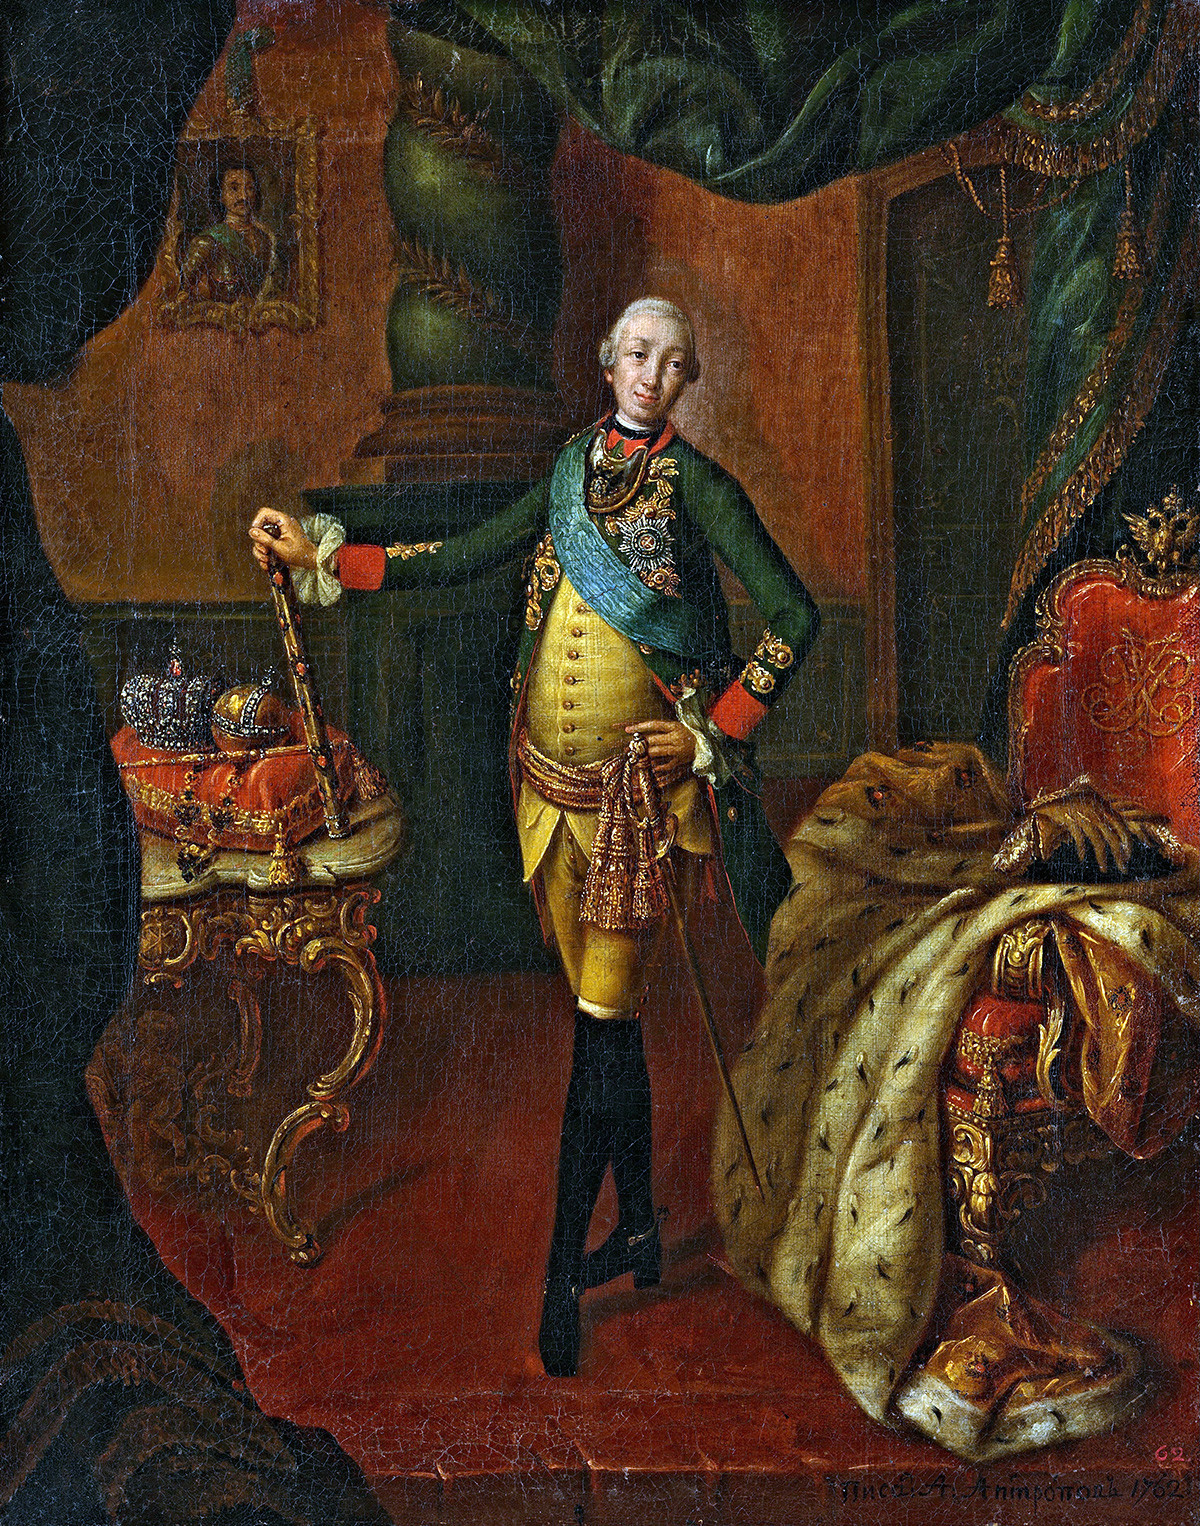 Алексей Антропов. Портрет императора Петра III Федоровича